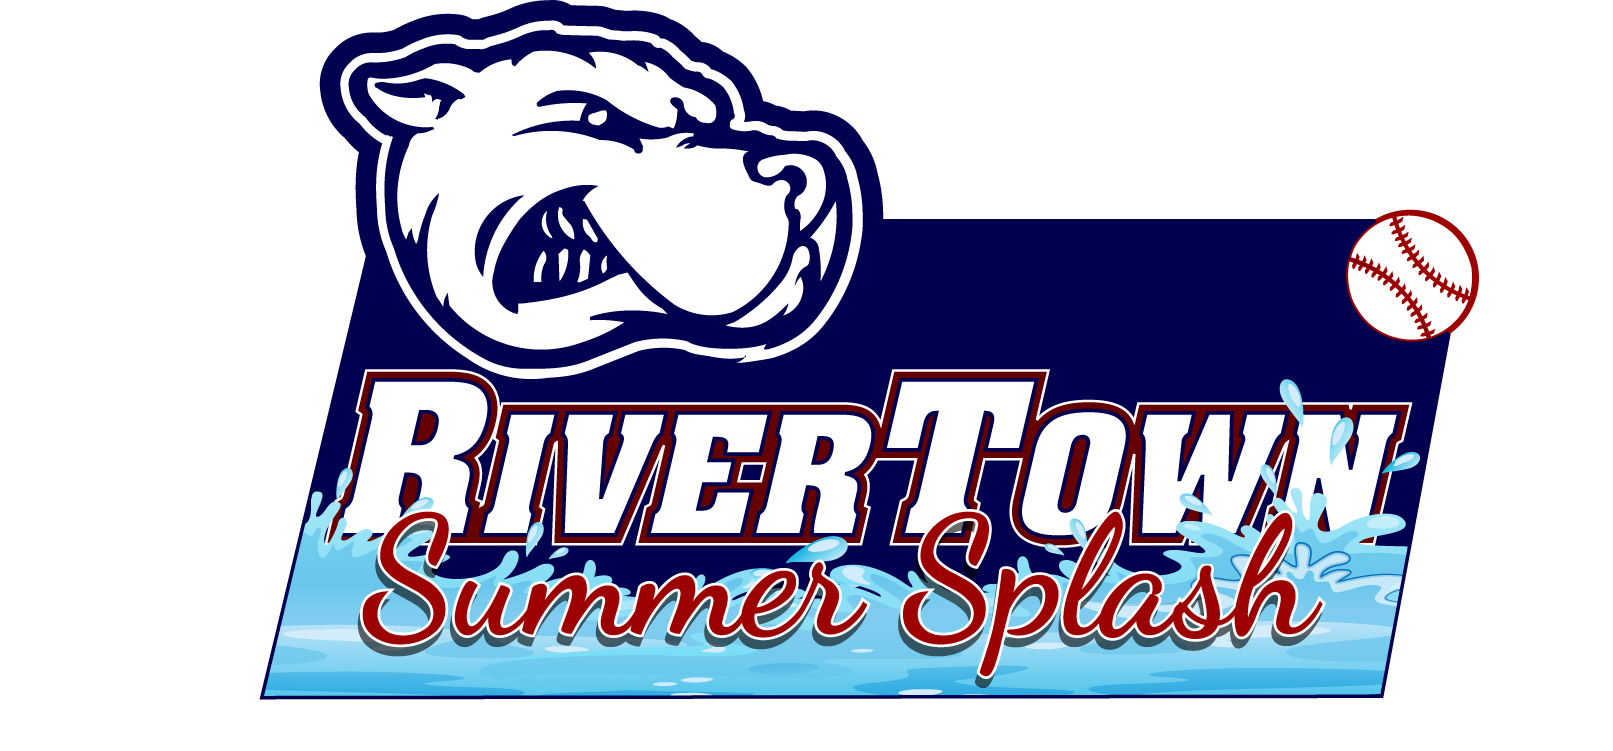 Rivertown Summer Splash Logo